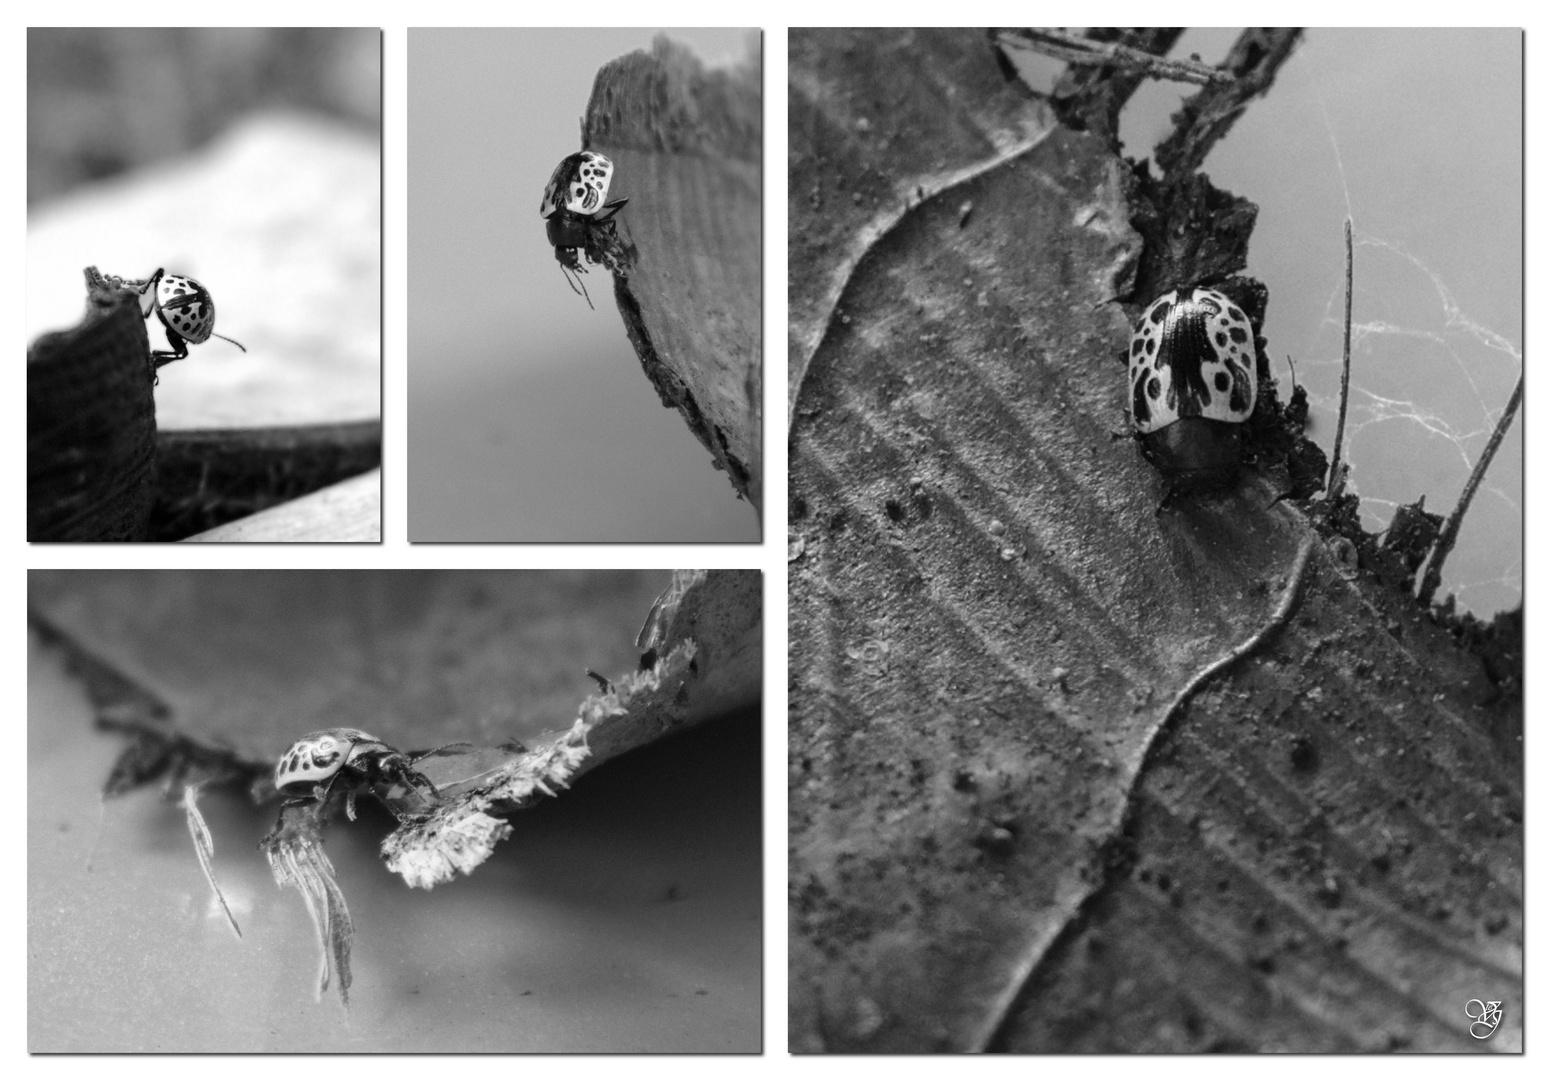 Käfer - Escarabajo             (Calligrapha amator)